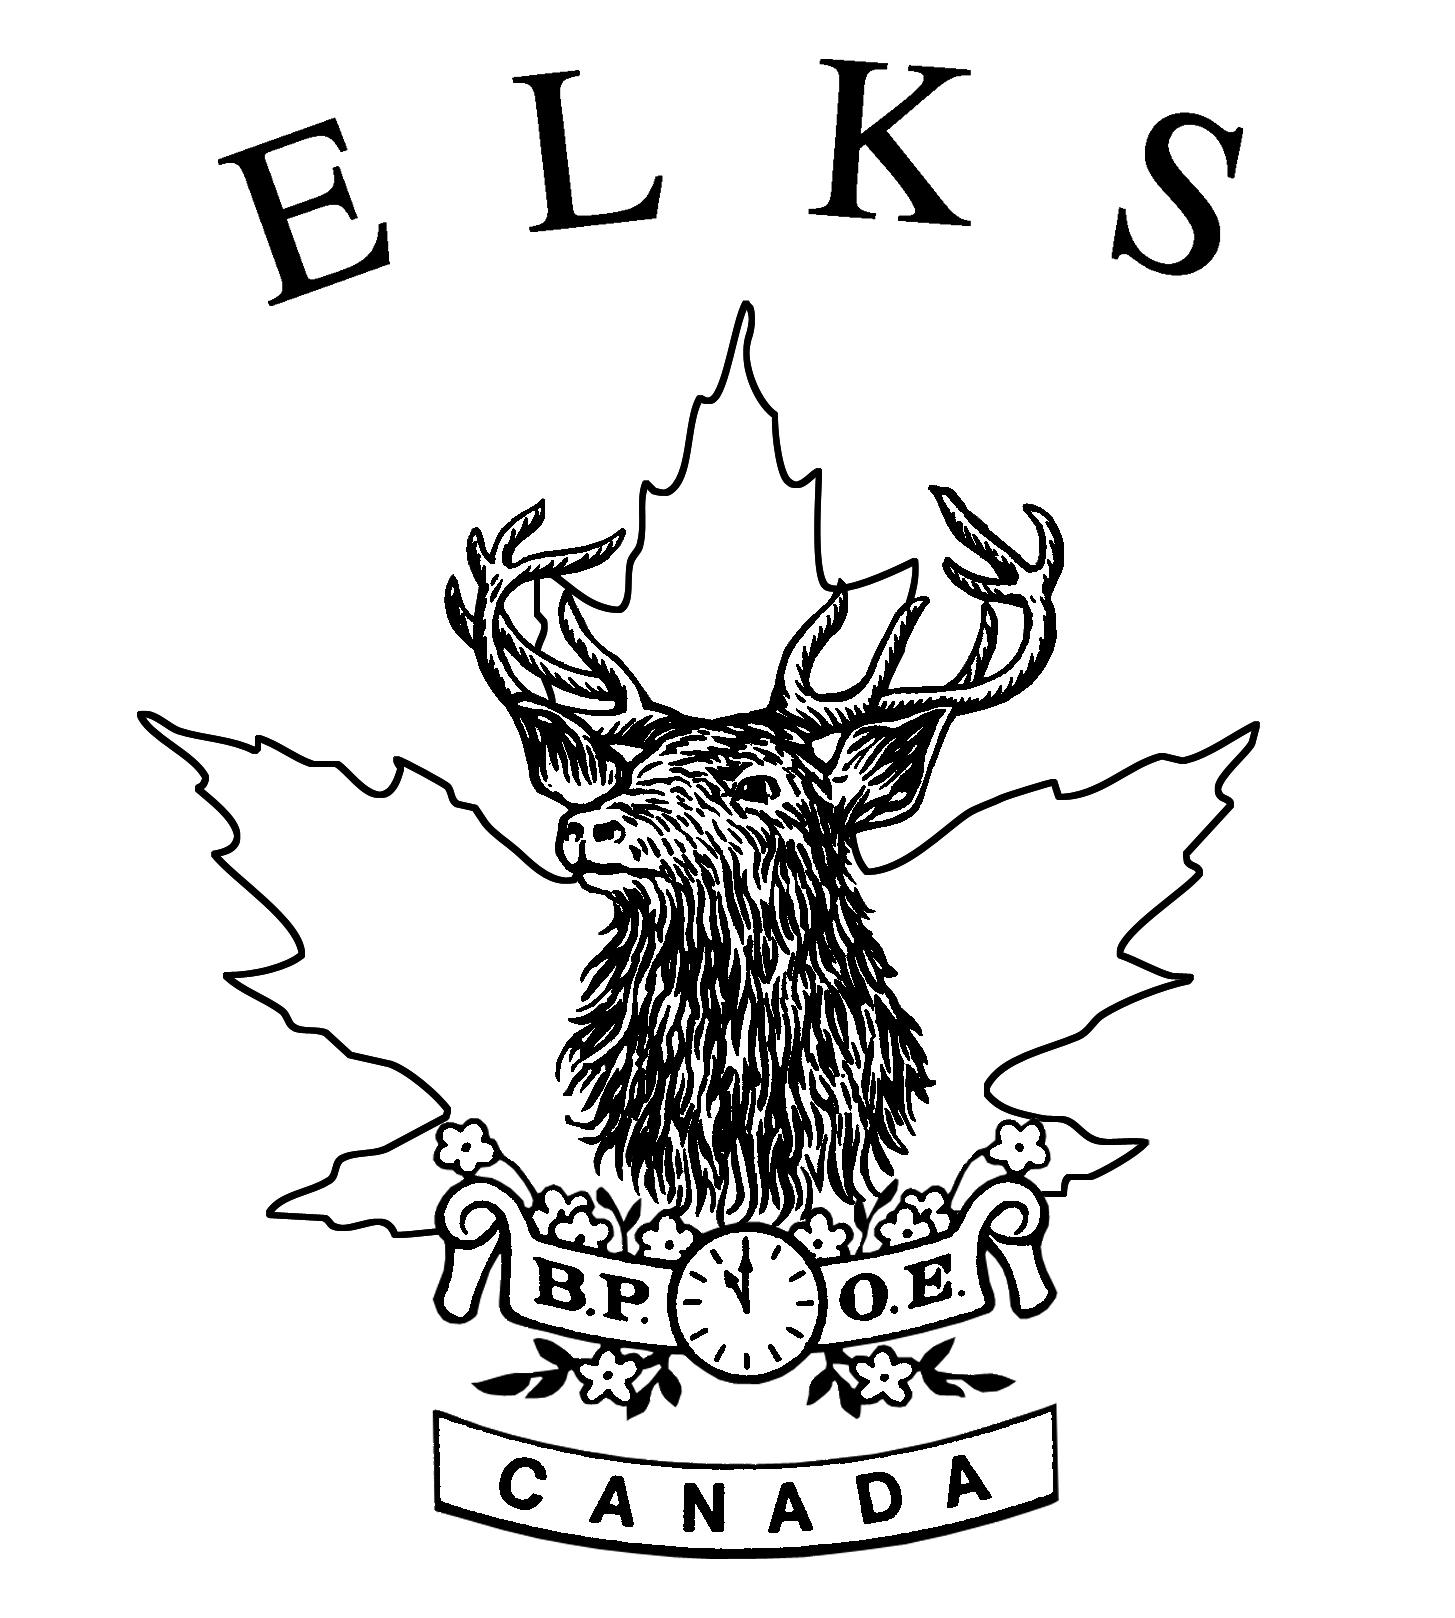 Elks-maple-leaf-bw.png